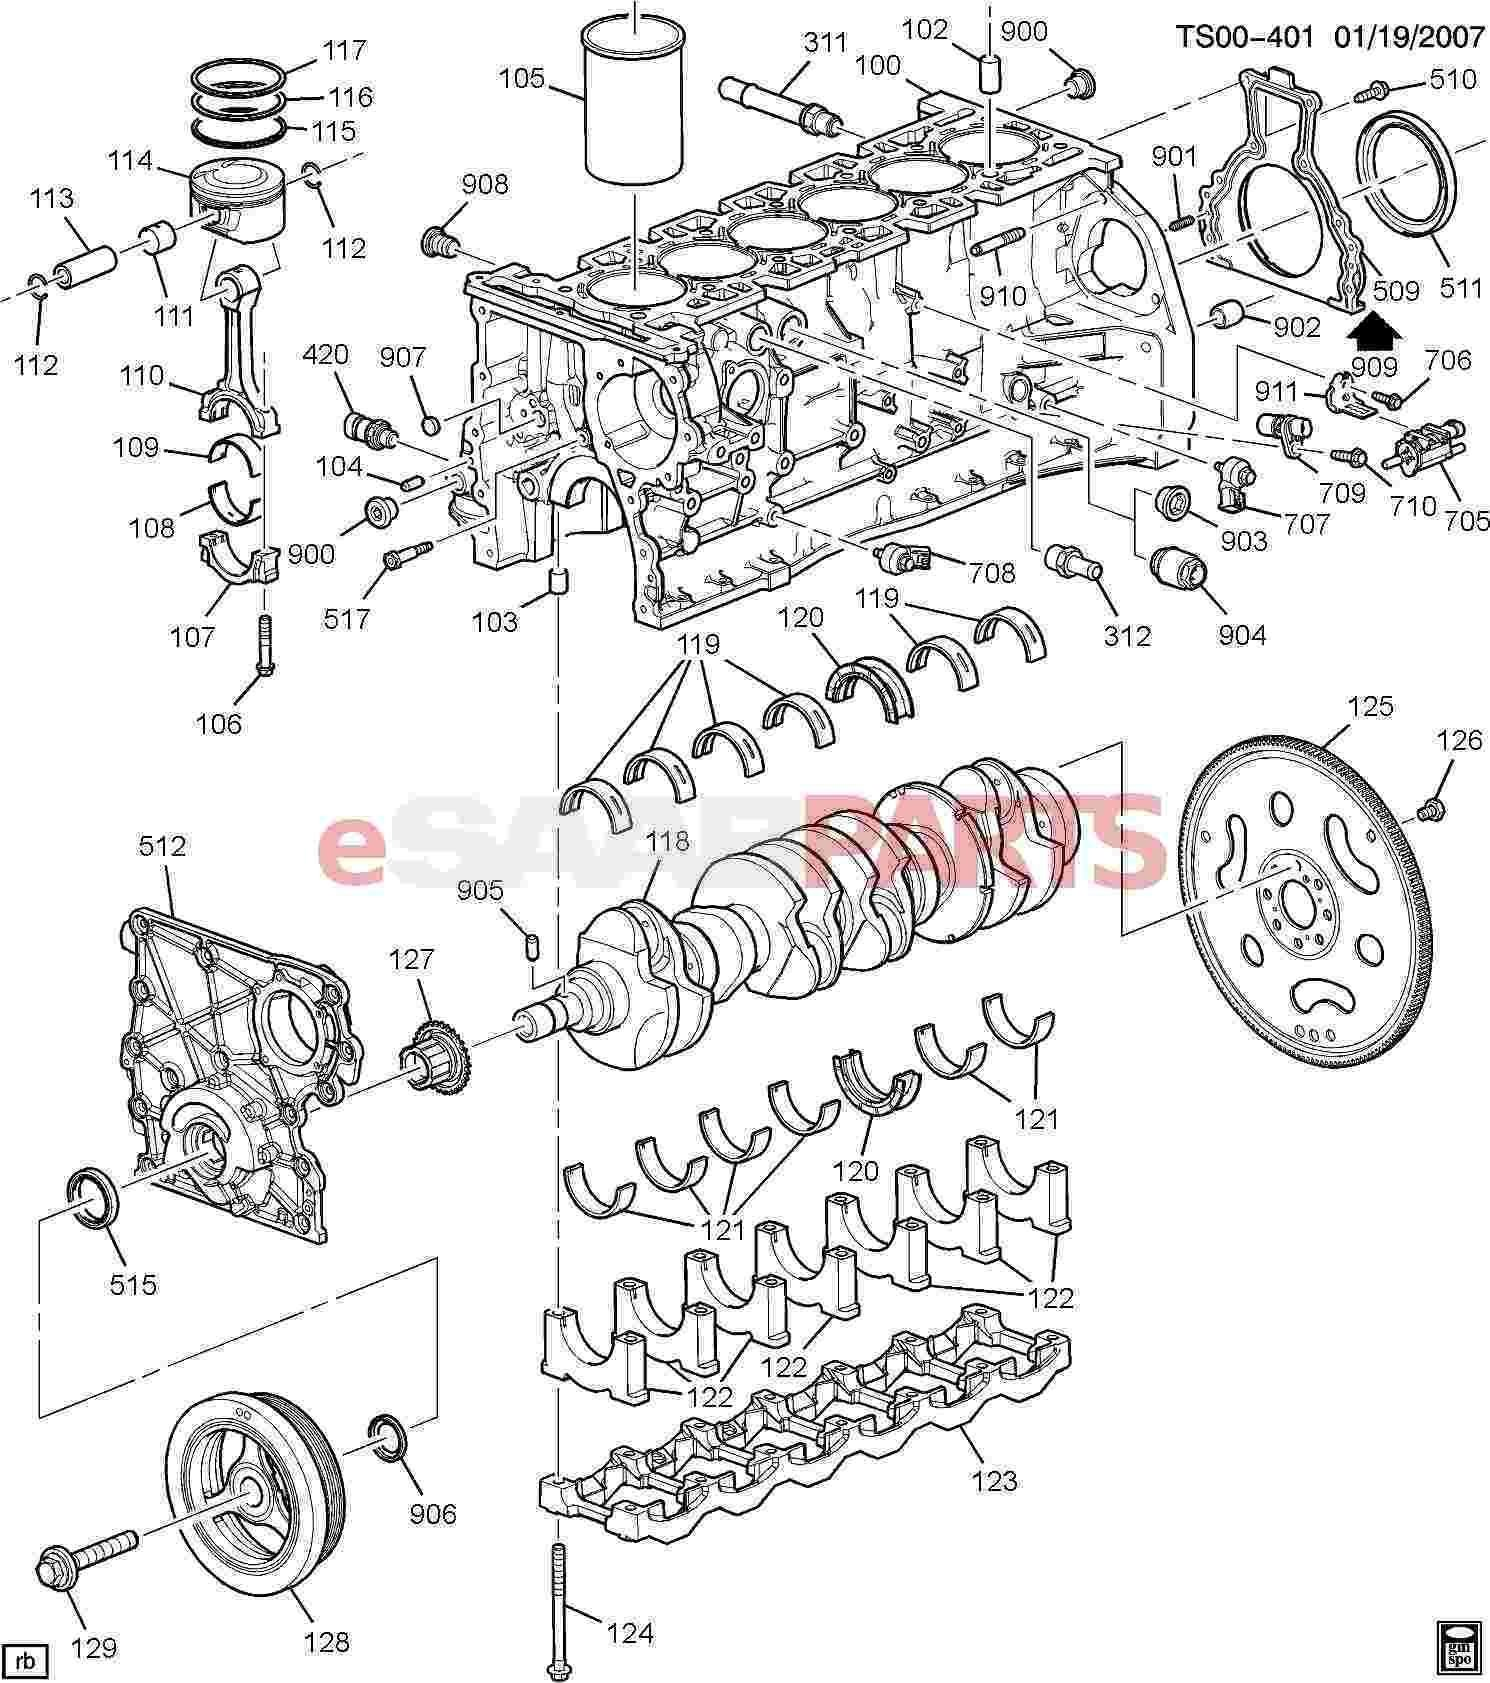 2007 chevy tahoe parts diagram